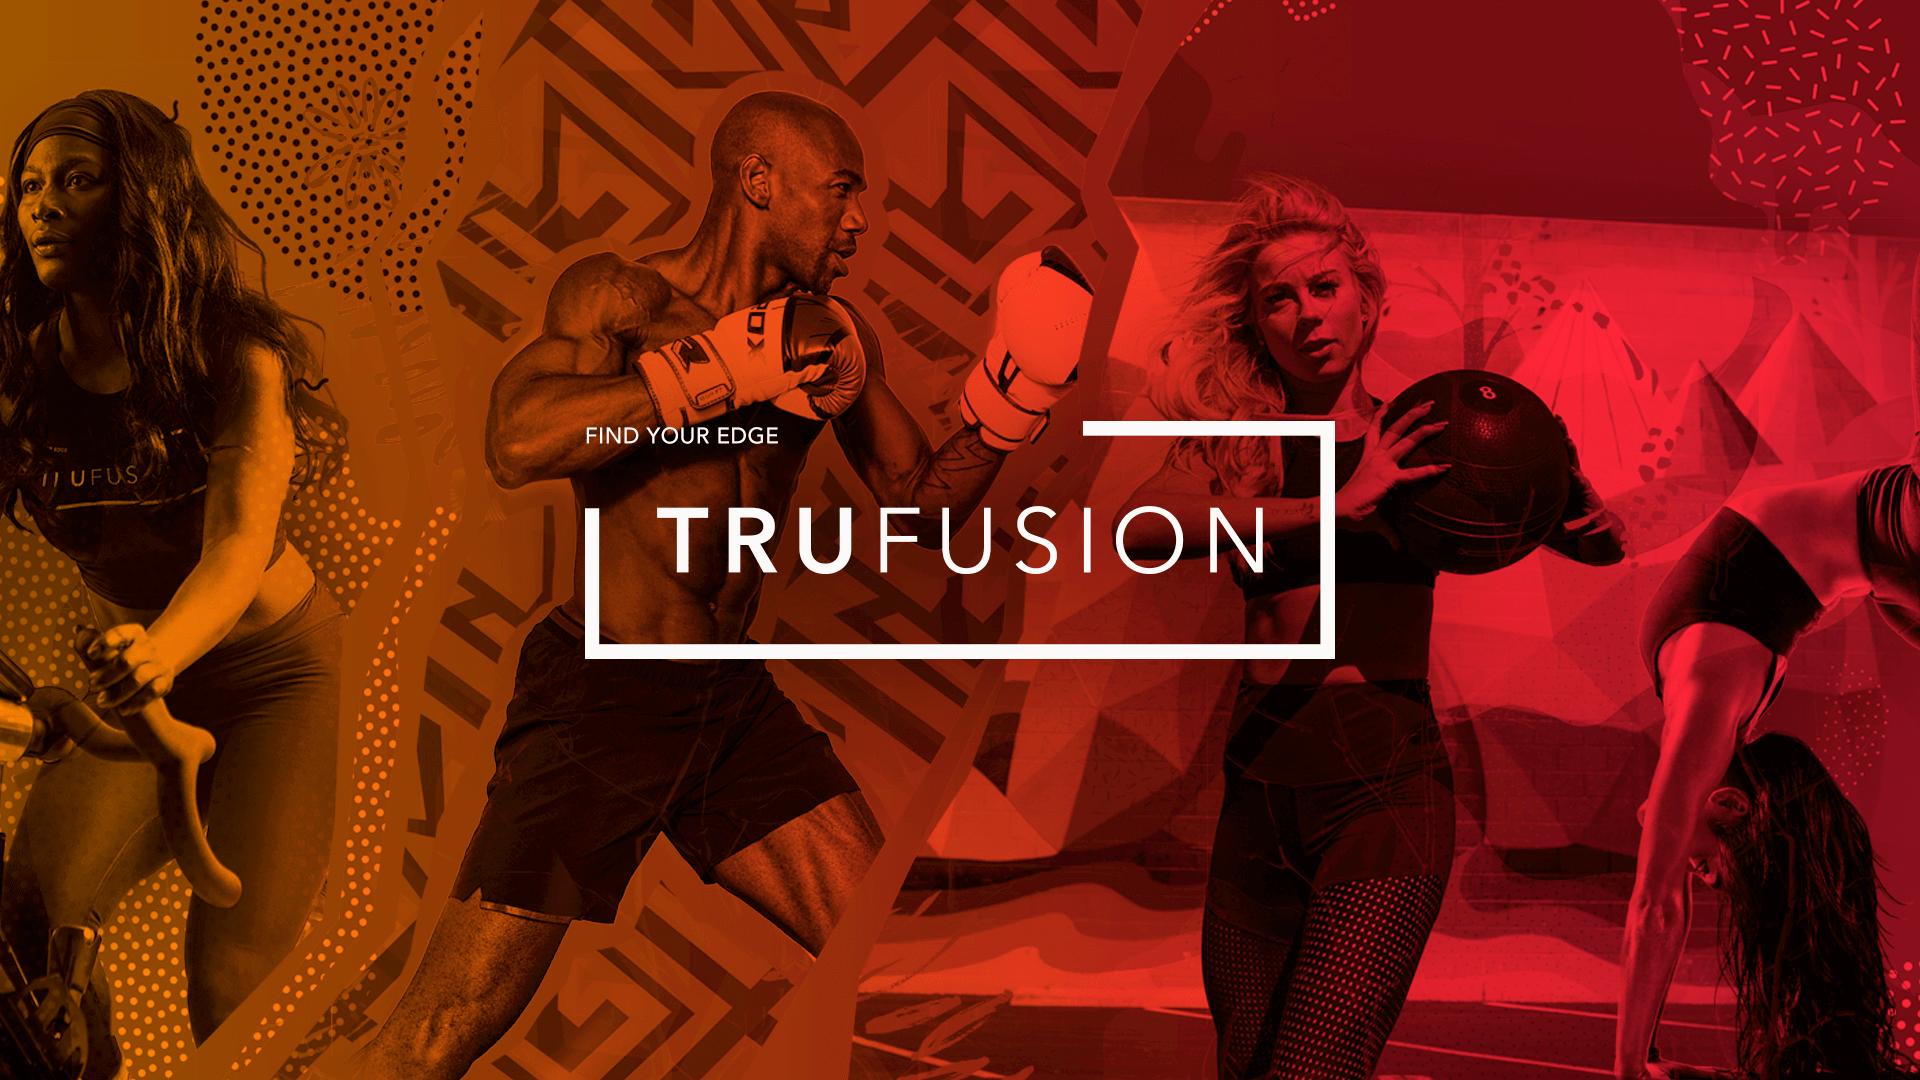 Generic TruFusion header image